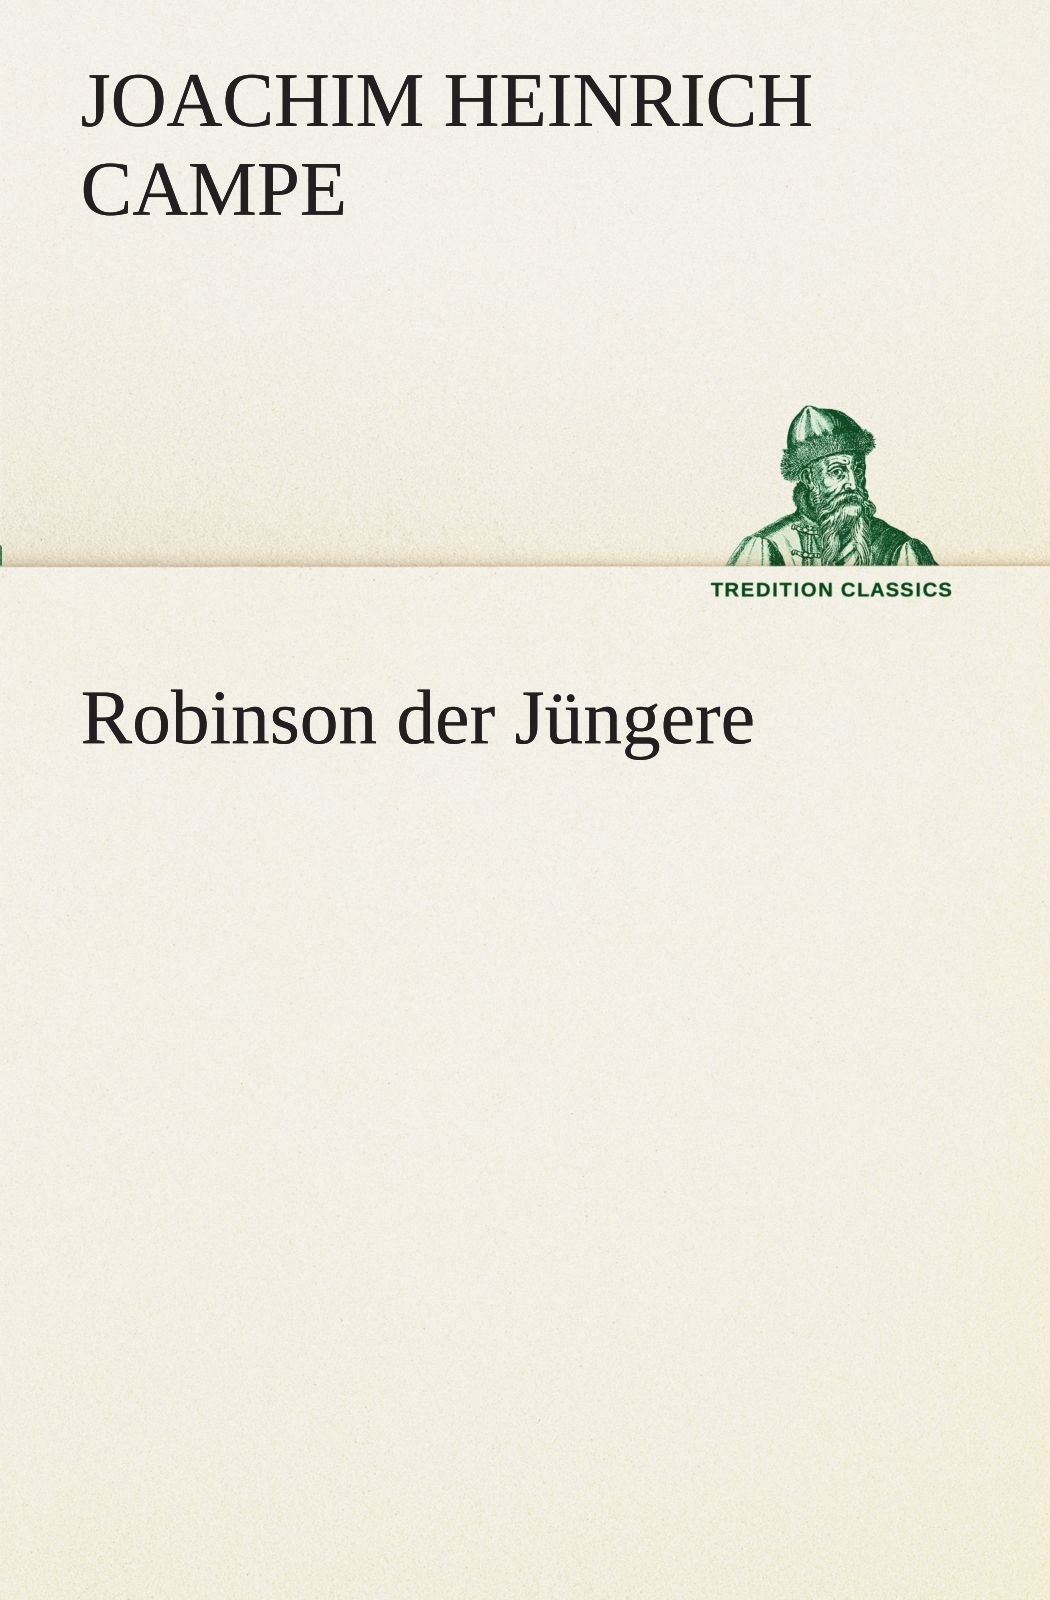 Read Online Robinson der Jüngere (TREDITION CLASSICS) (German Edition) PDF